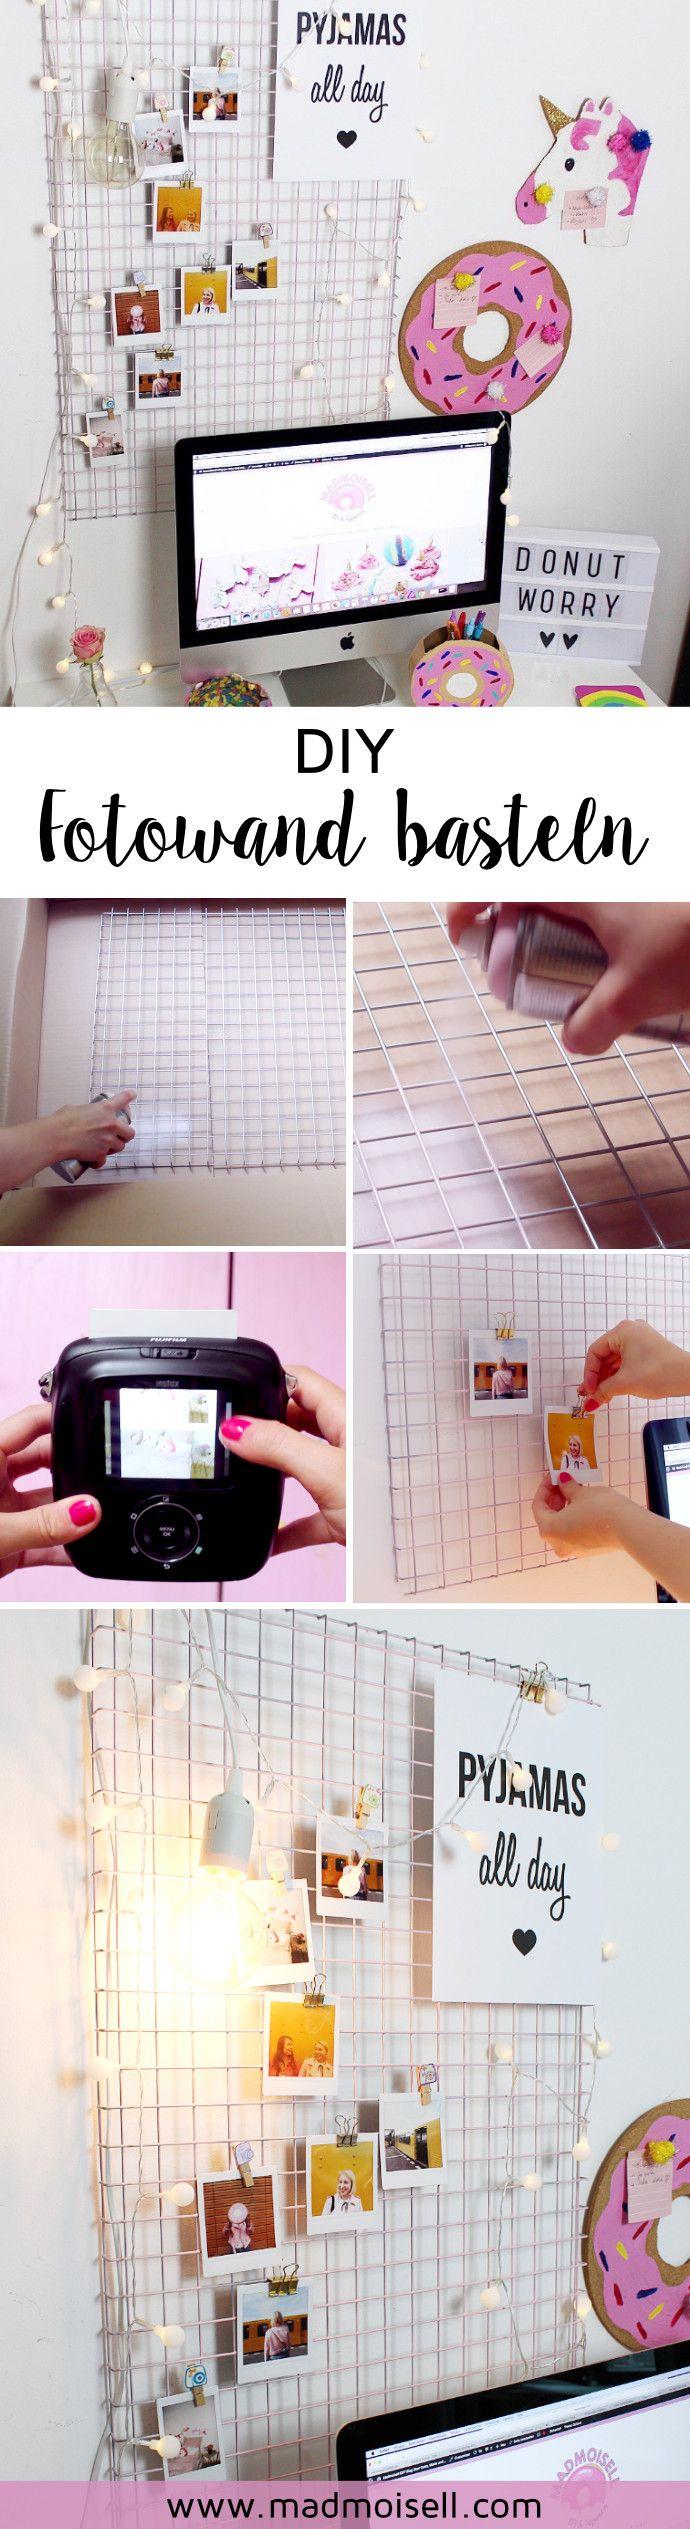 484 best images about madmoisell diy projekte basteln selbermachen on pinterest. Black Bedroom Furniture Sets. Home Design Ideas